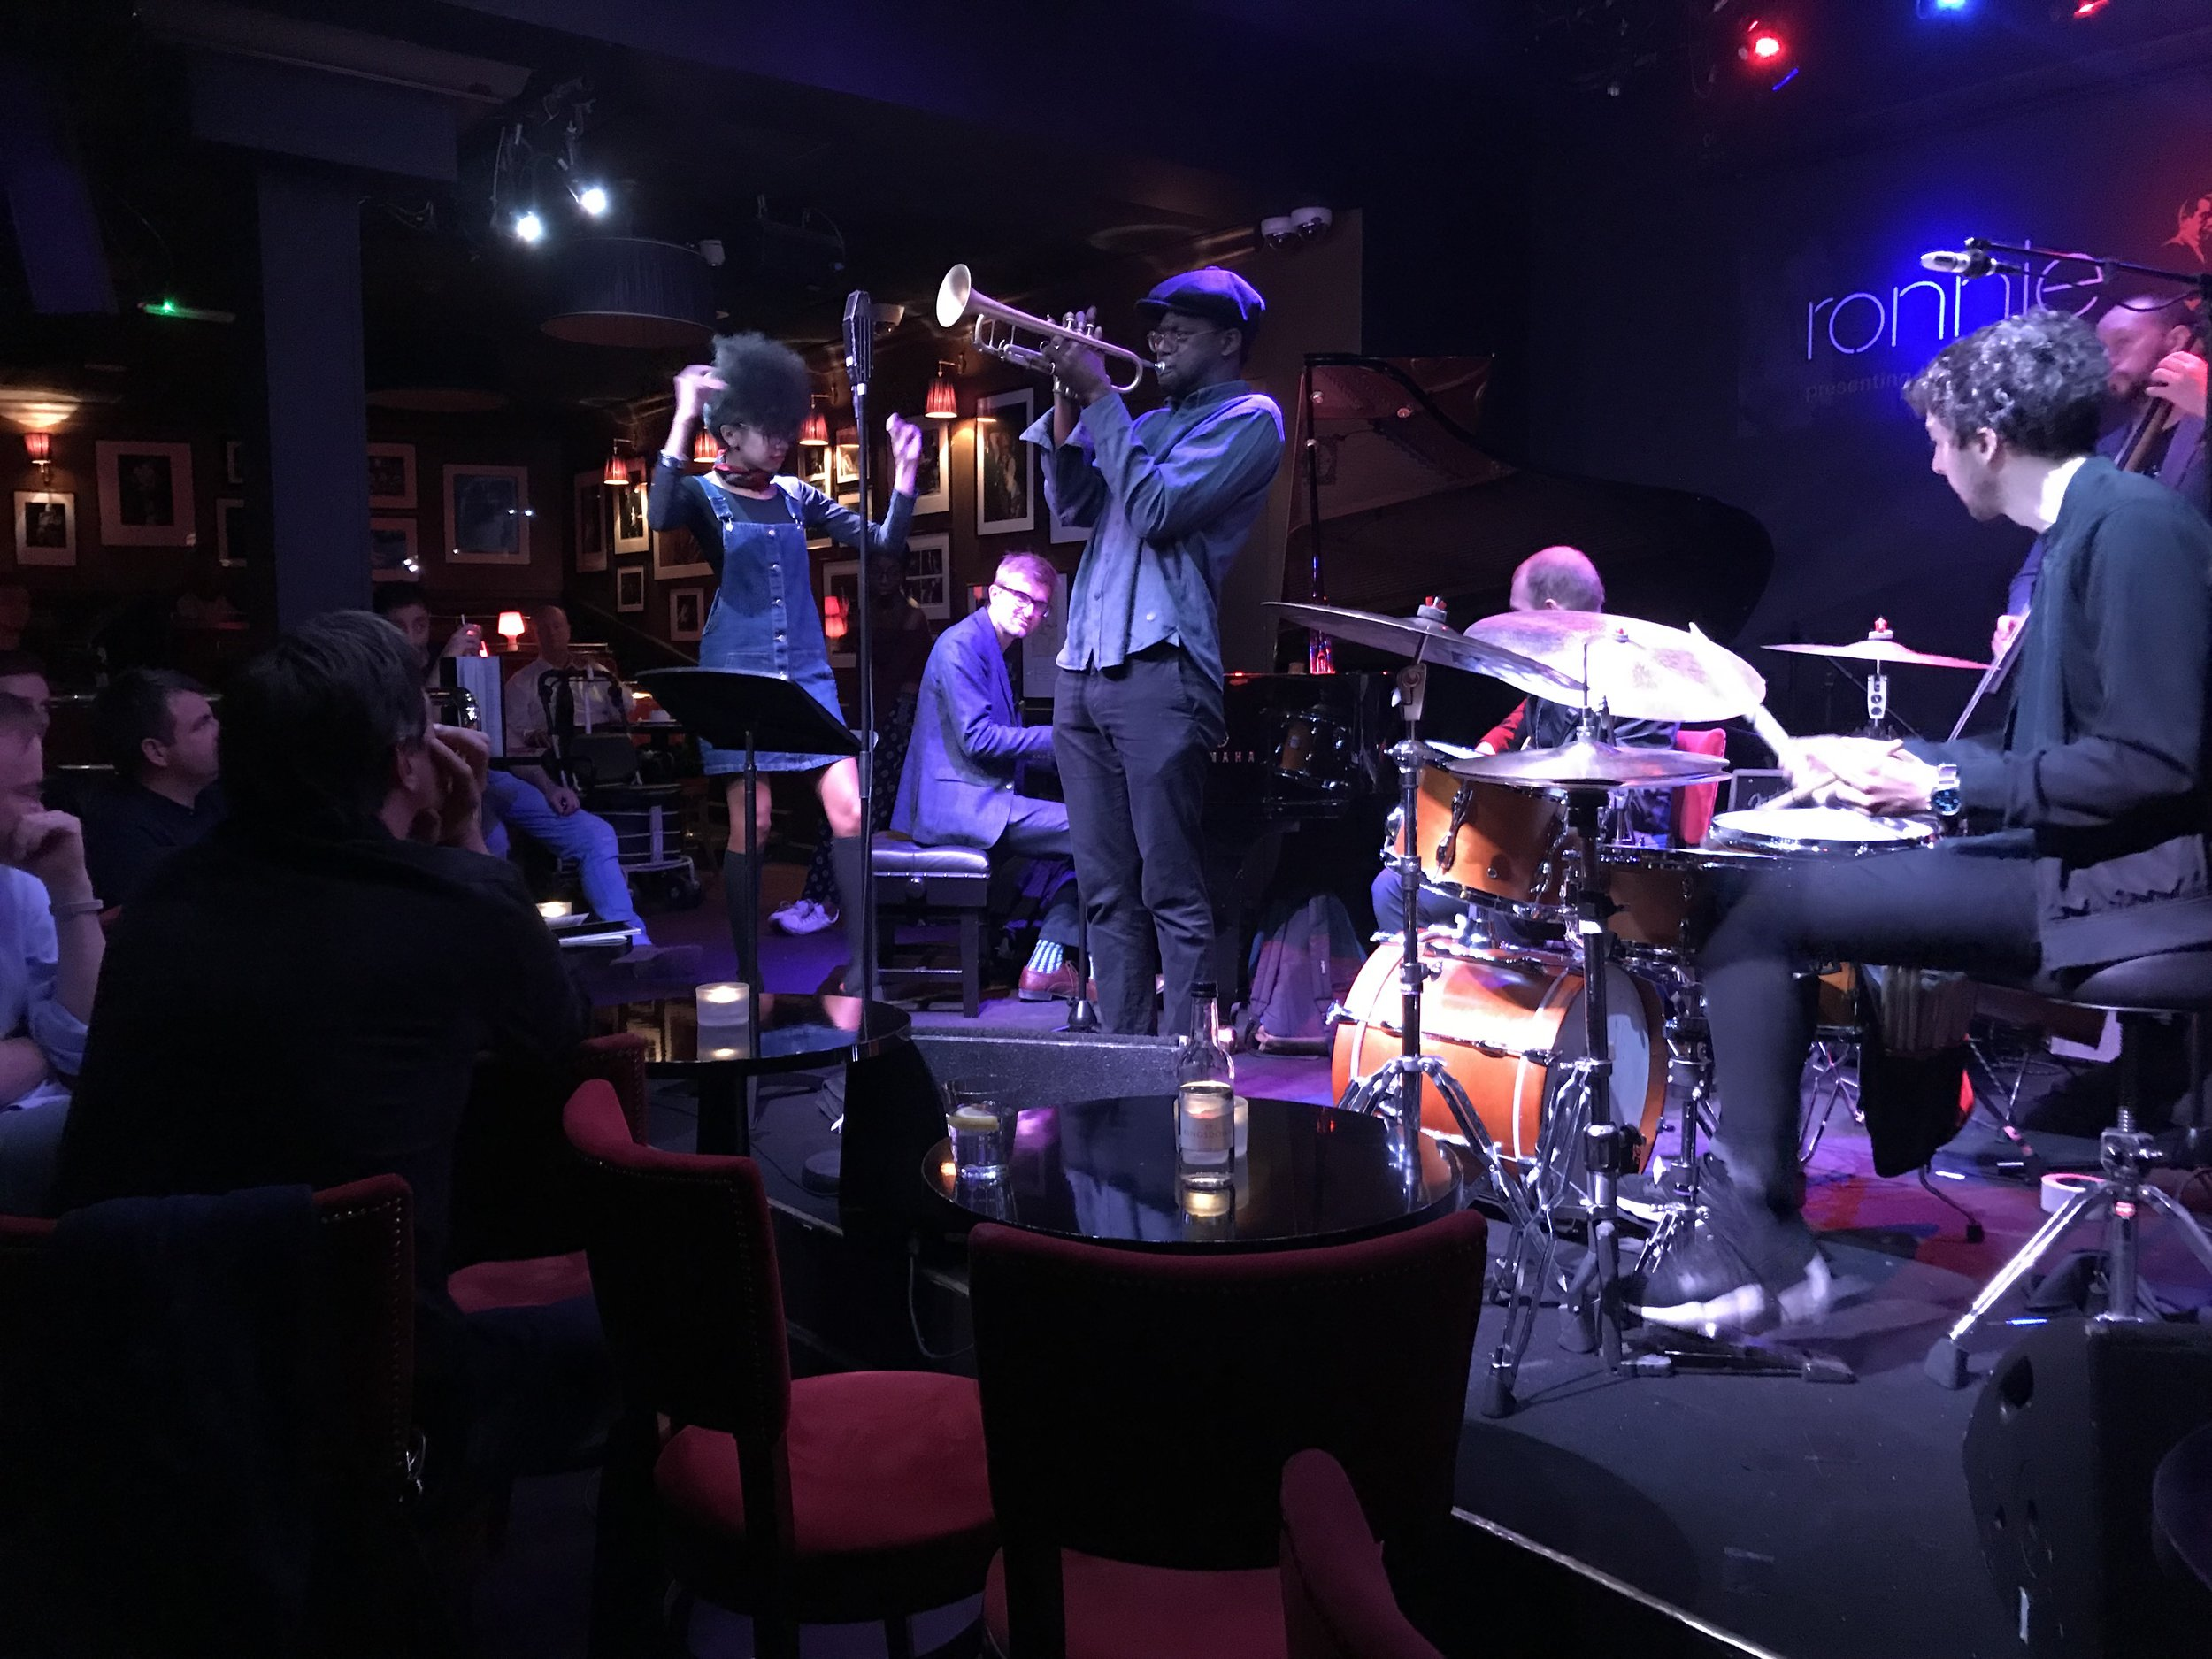 Mark Kavuma hosts the Late Late Show at Ronnie Scott's, with vocalist Judi jackson.